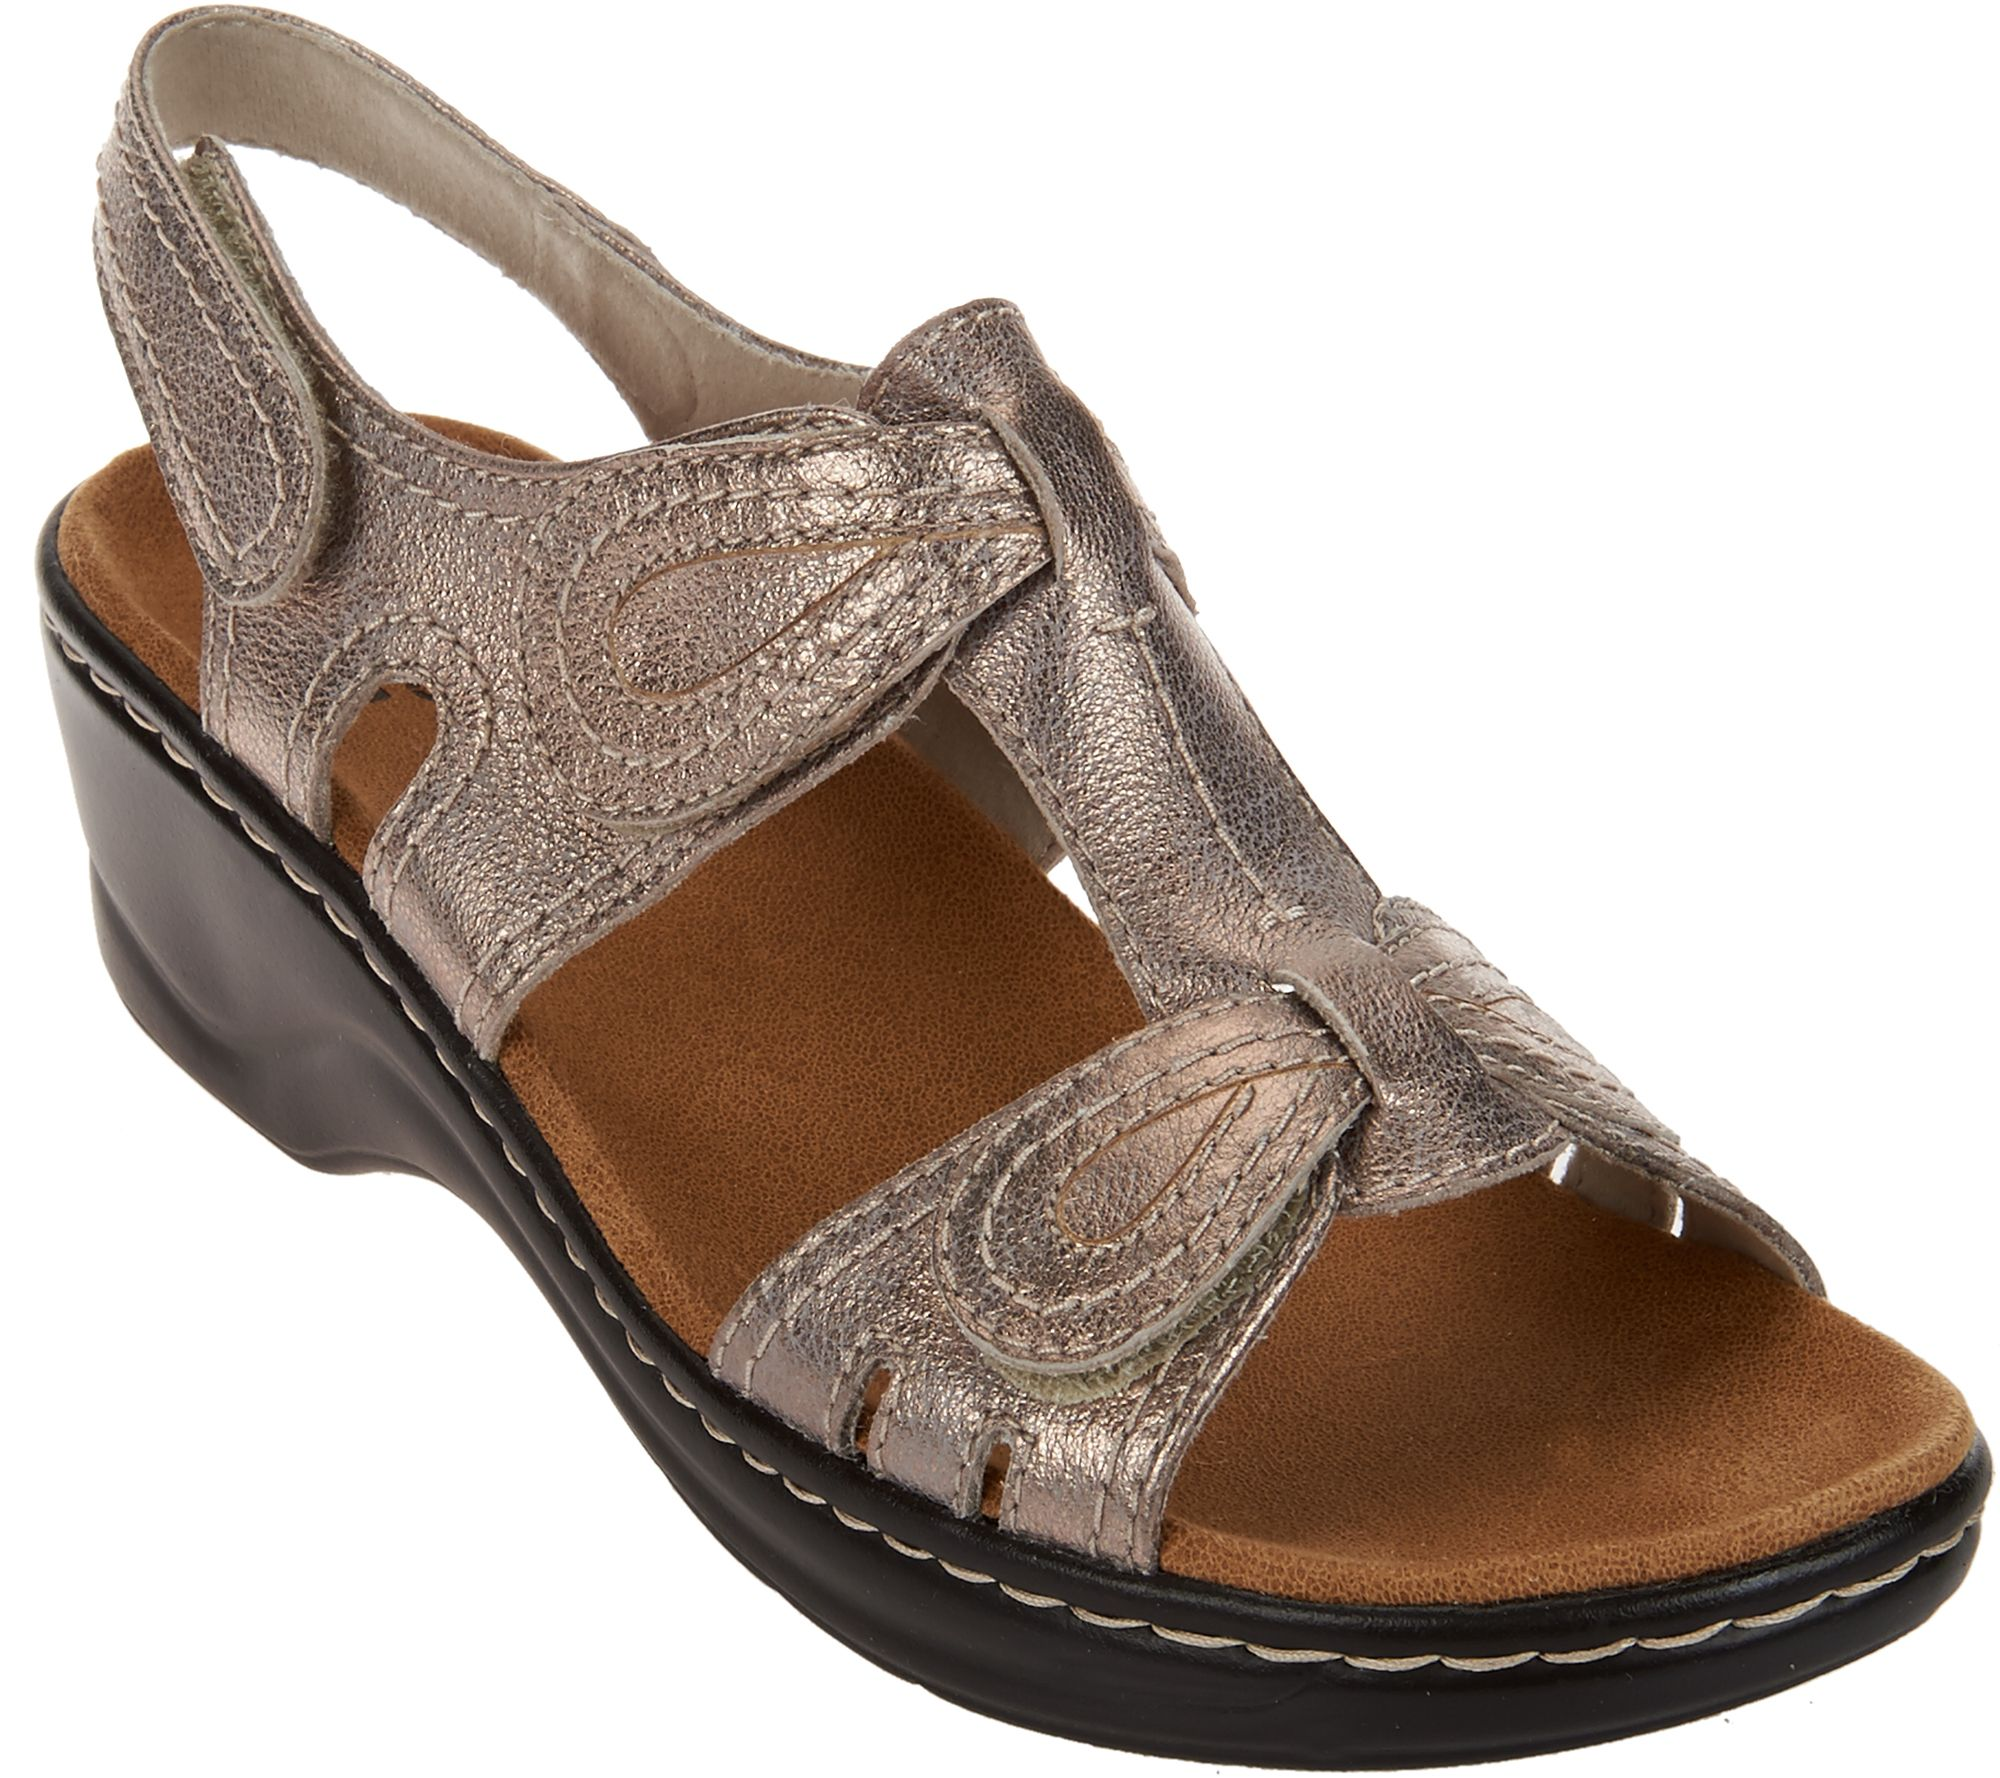 106163ddfae Clarks Leather Sandals w Adjustability - Lexi Walnut - Page 1 — QVC.com